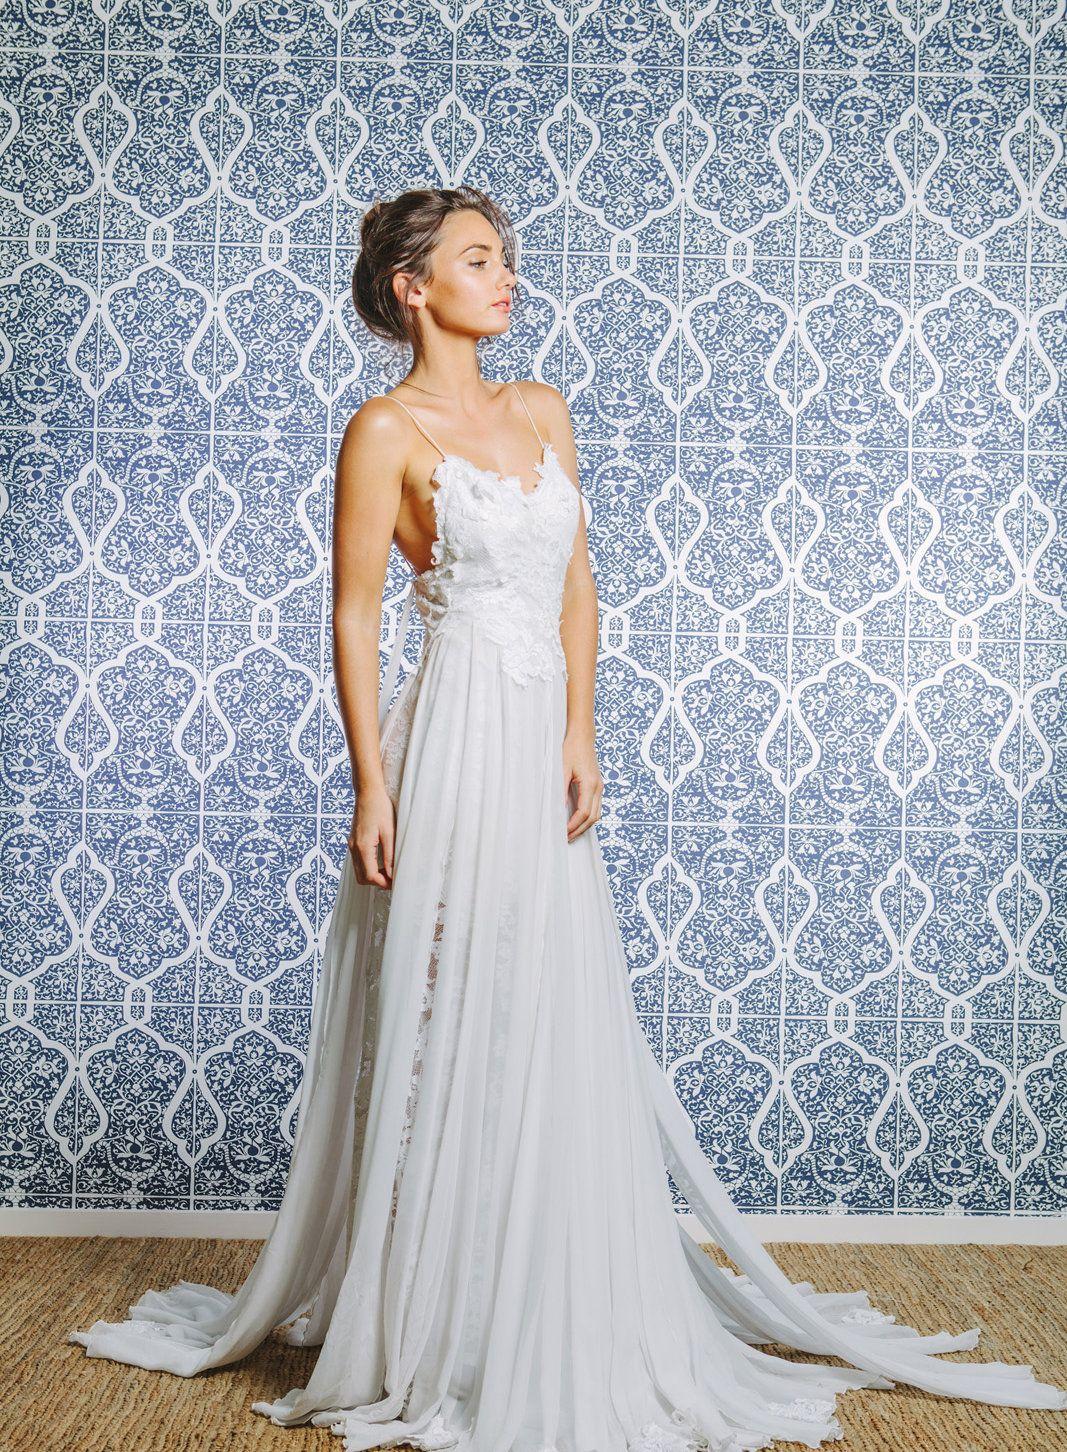 Stunning Wedding Dress Hollie Grace Loves Lace